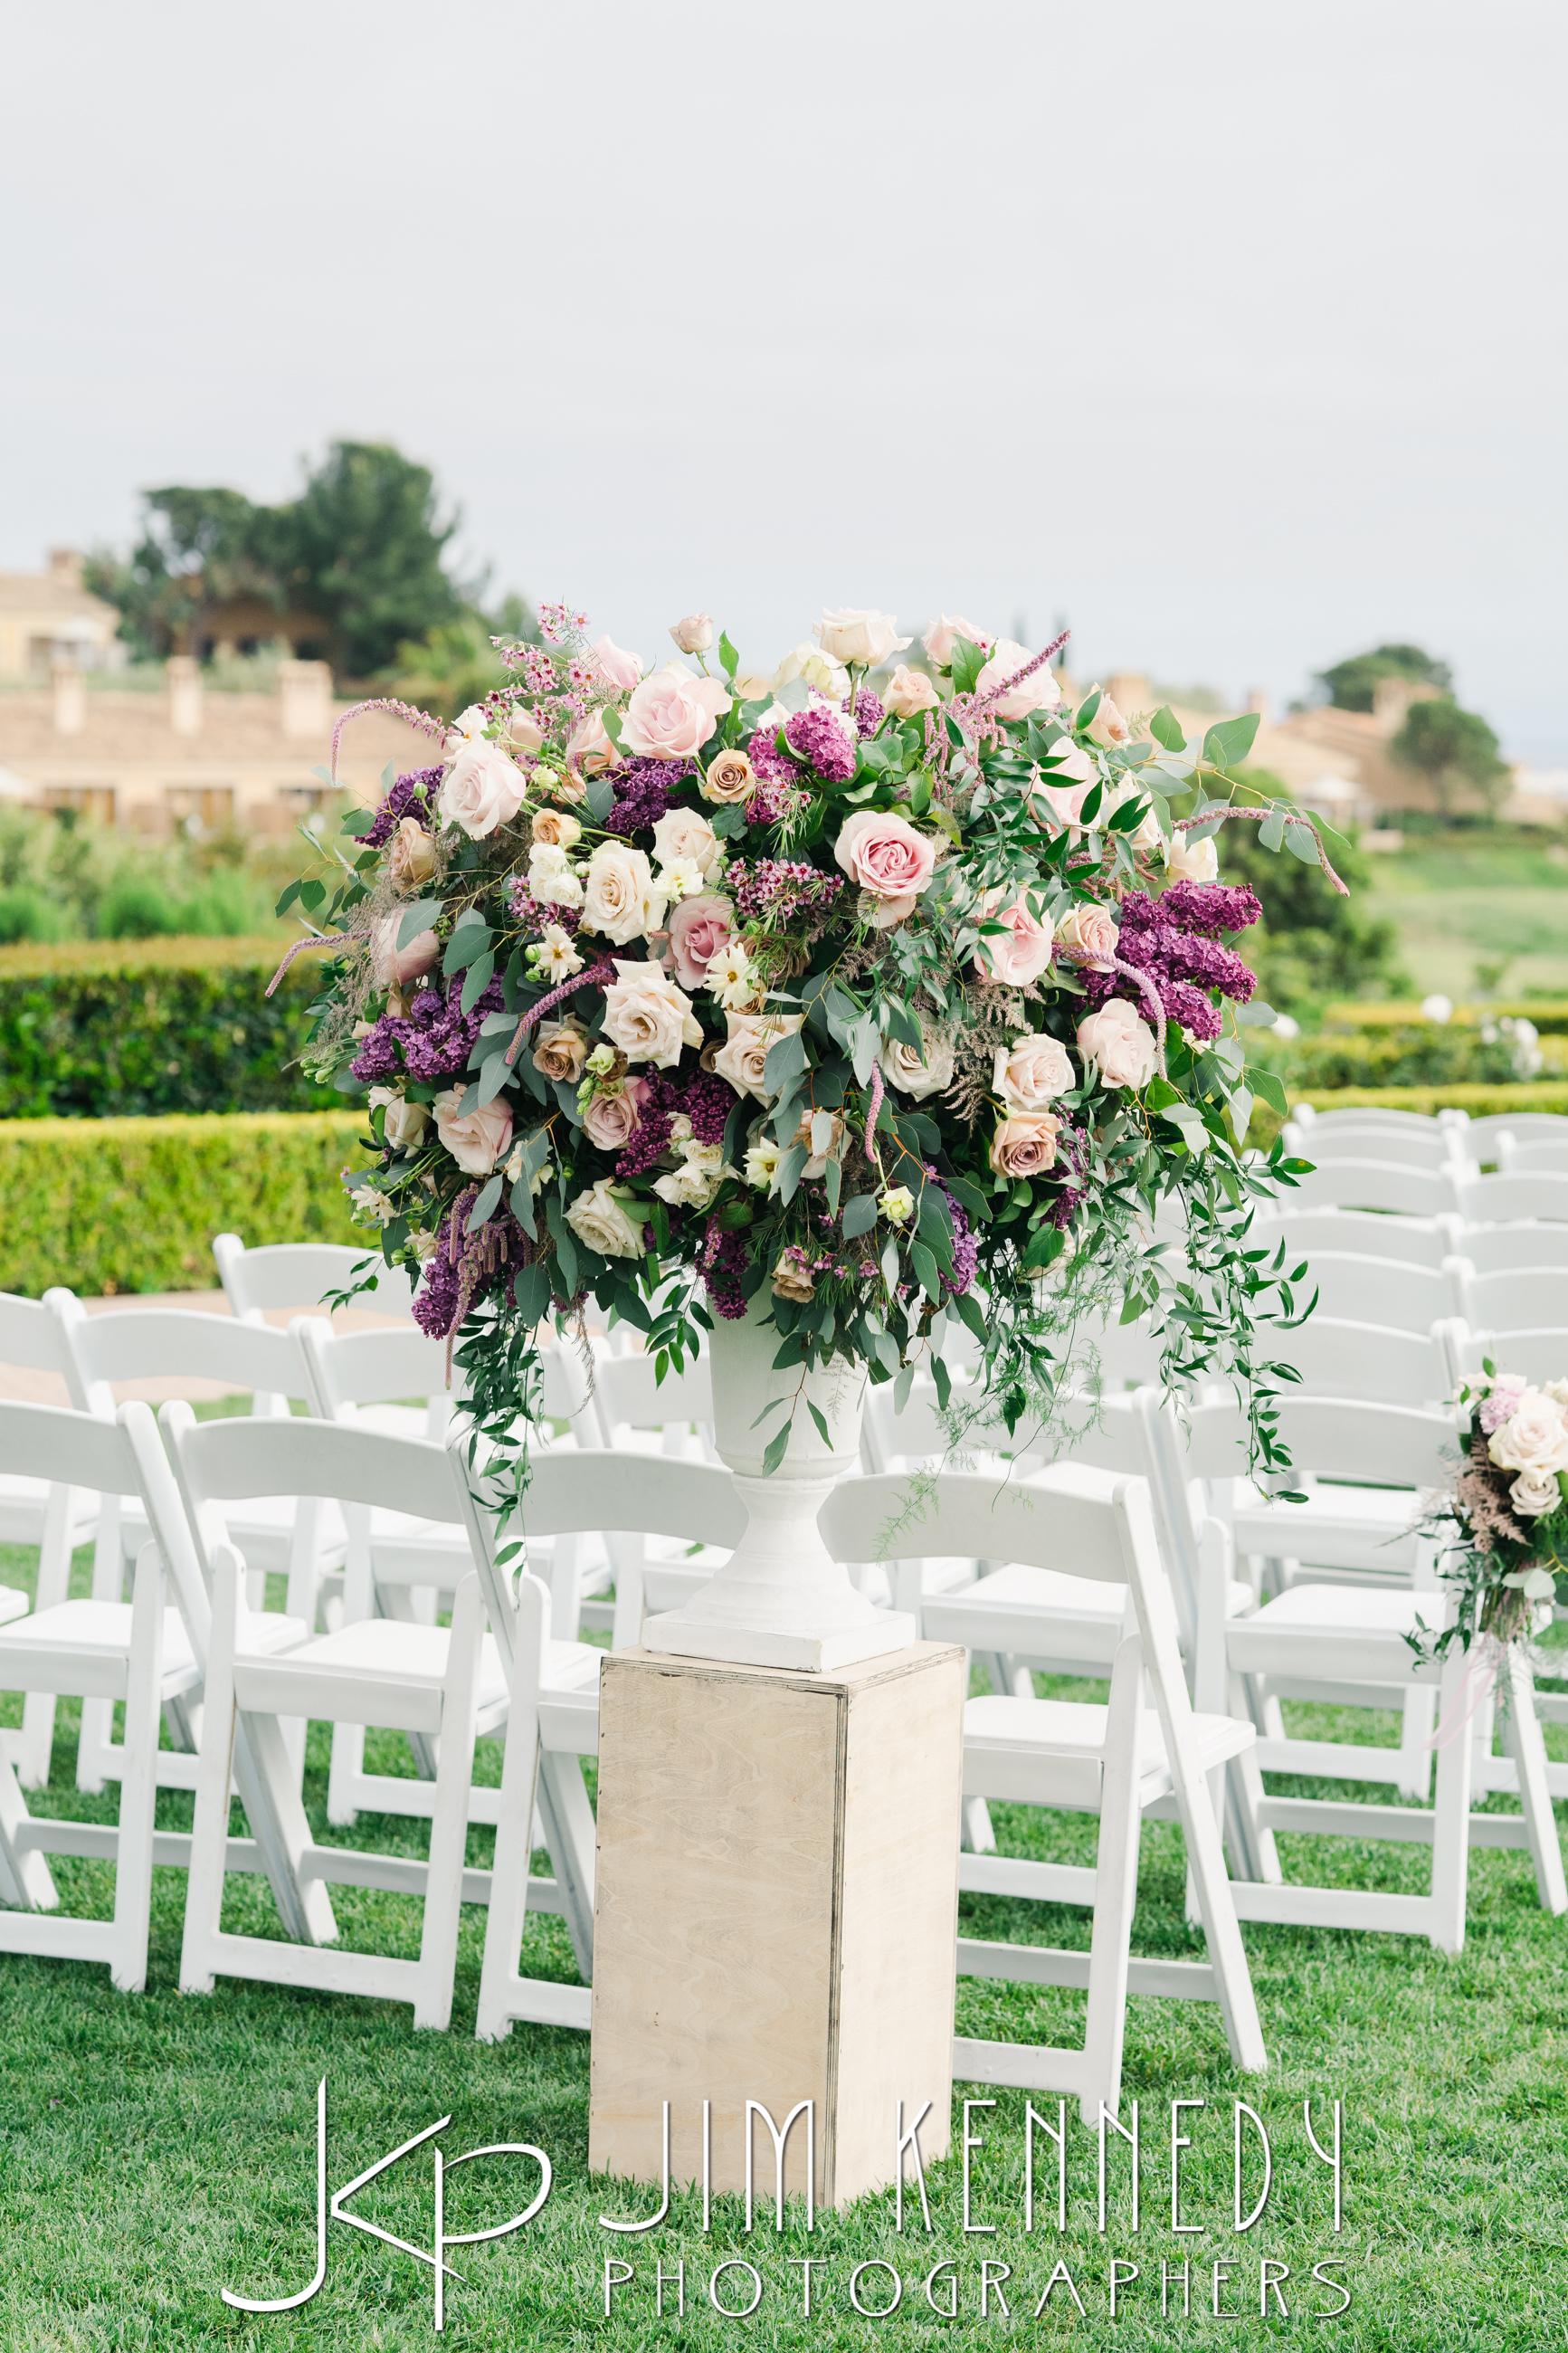 pelican-hill-wedding-jim-kenedy-photographers_0091.JPG